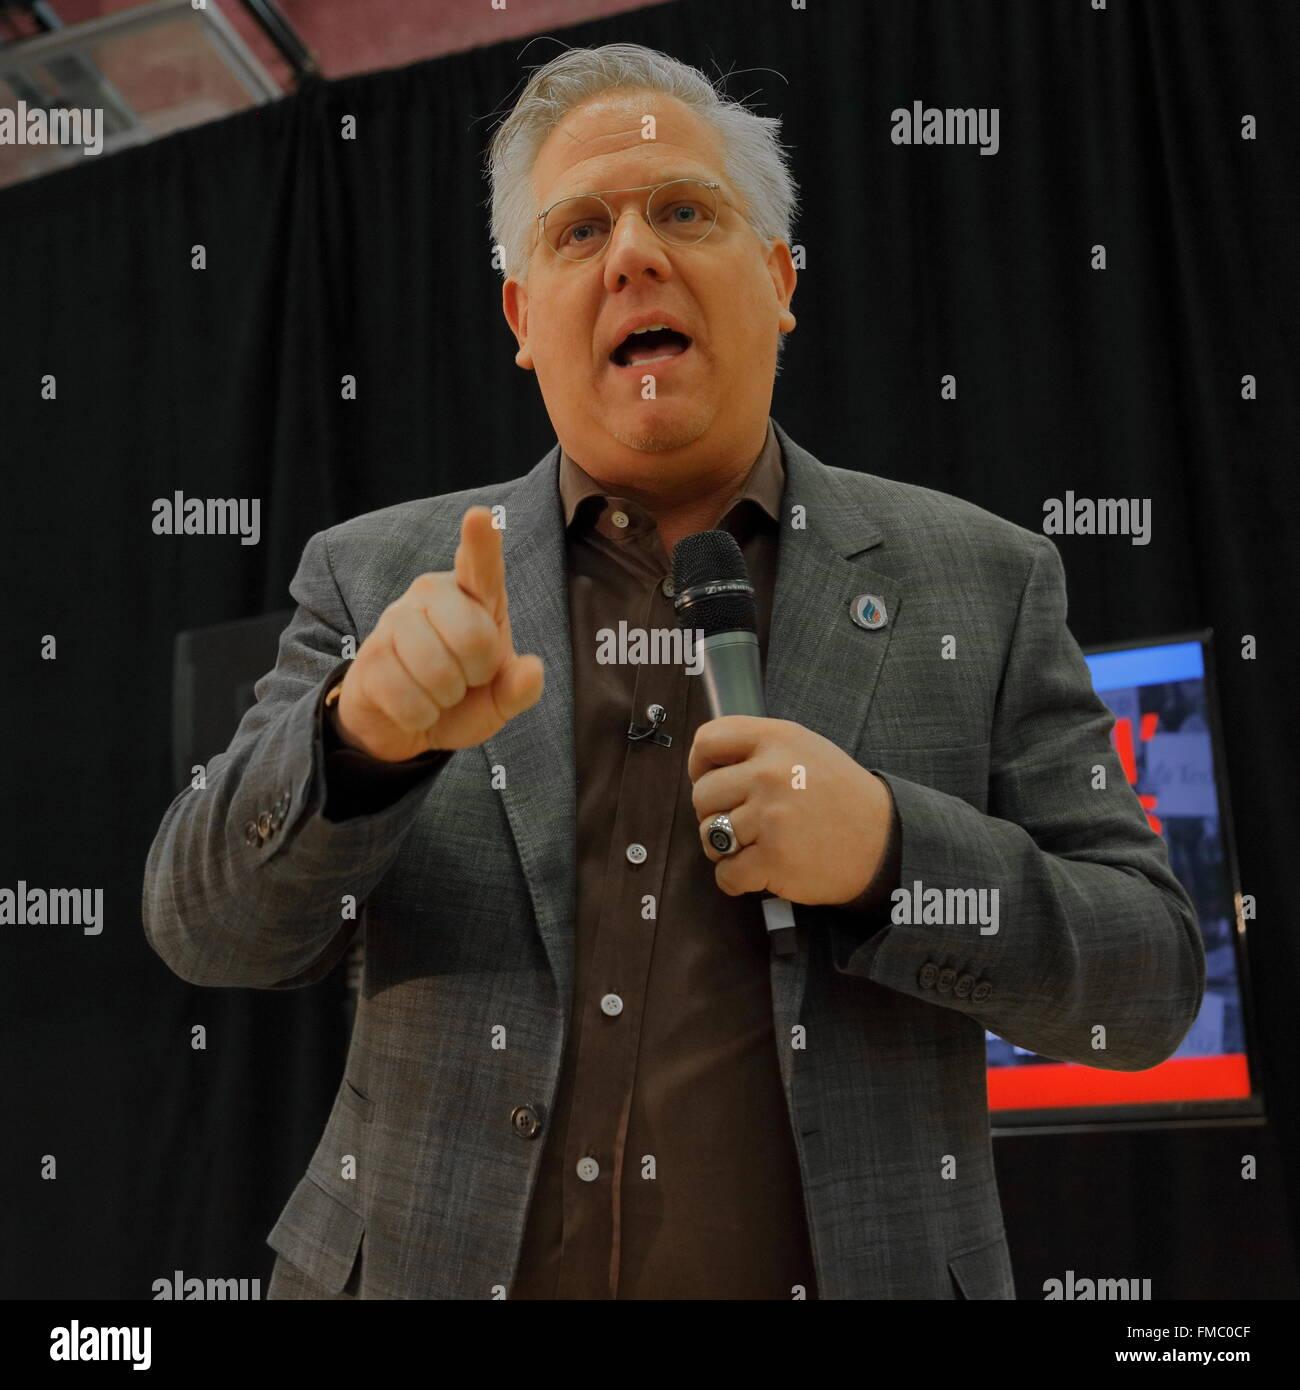 Talk show host Glenn Beck introduces US Senator Ted Cruz Campaigns in Las Vegas before Republican Nevada Caucus - Stock Image